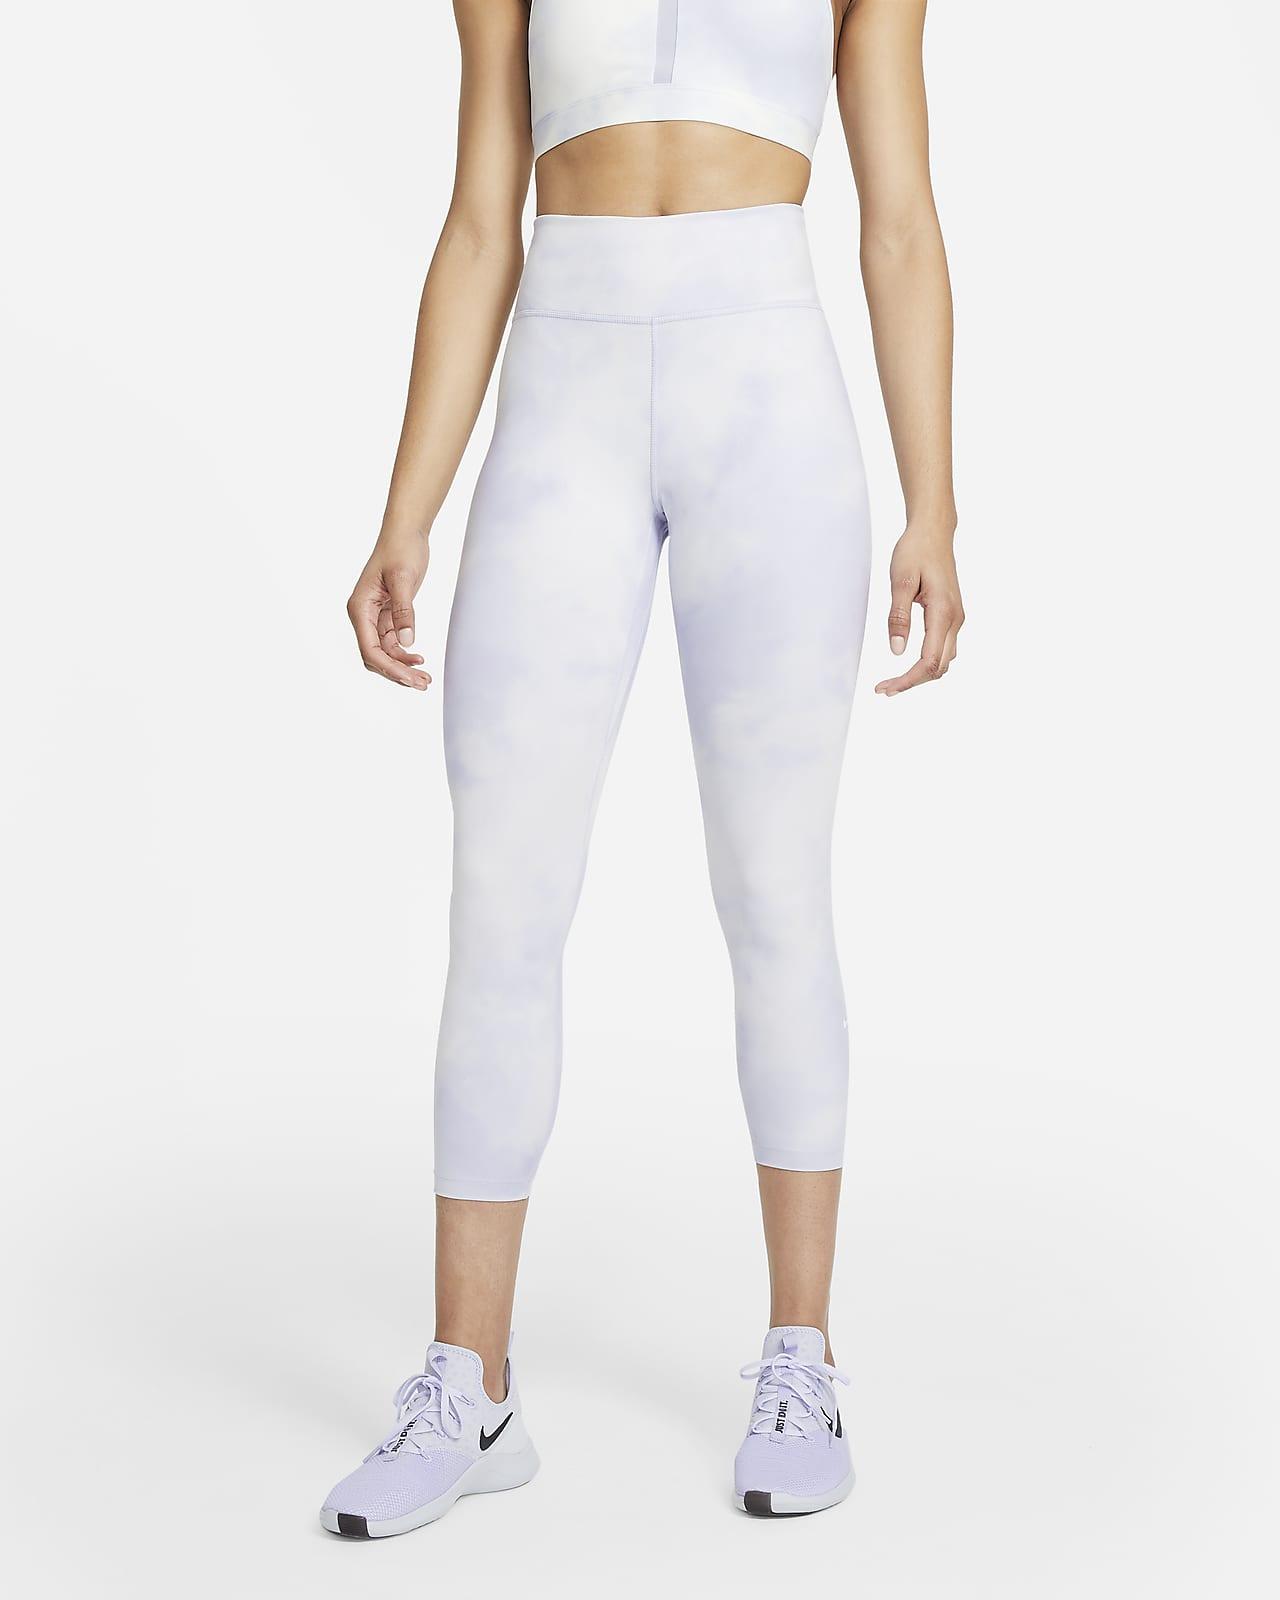 Nike One Icon Clash 女款中腰短版內搭褲